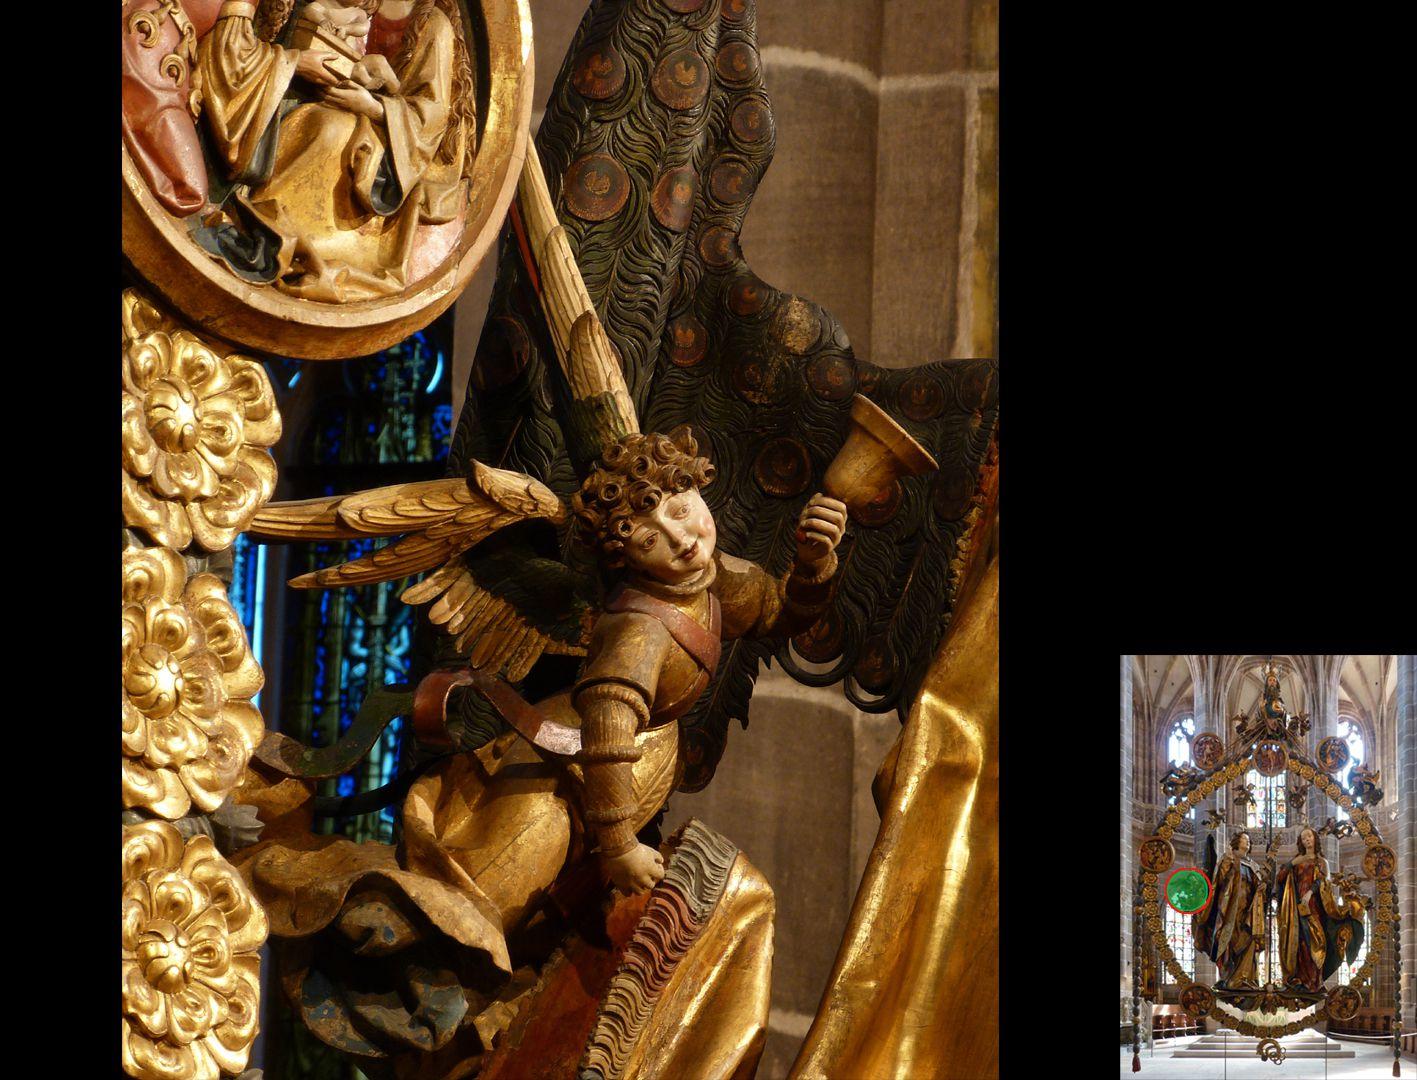 Englischer Gruß Engel mit Handglocke den Umhang Gabriels anhebend (unten rechts Detaillokalisierung)